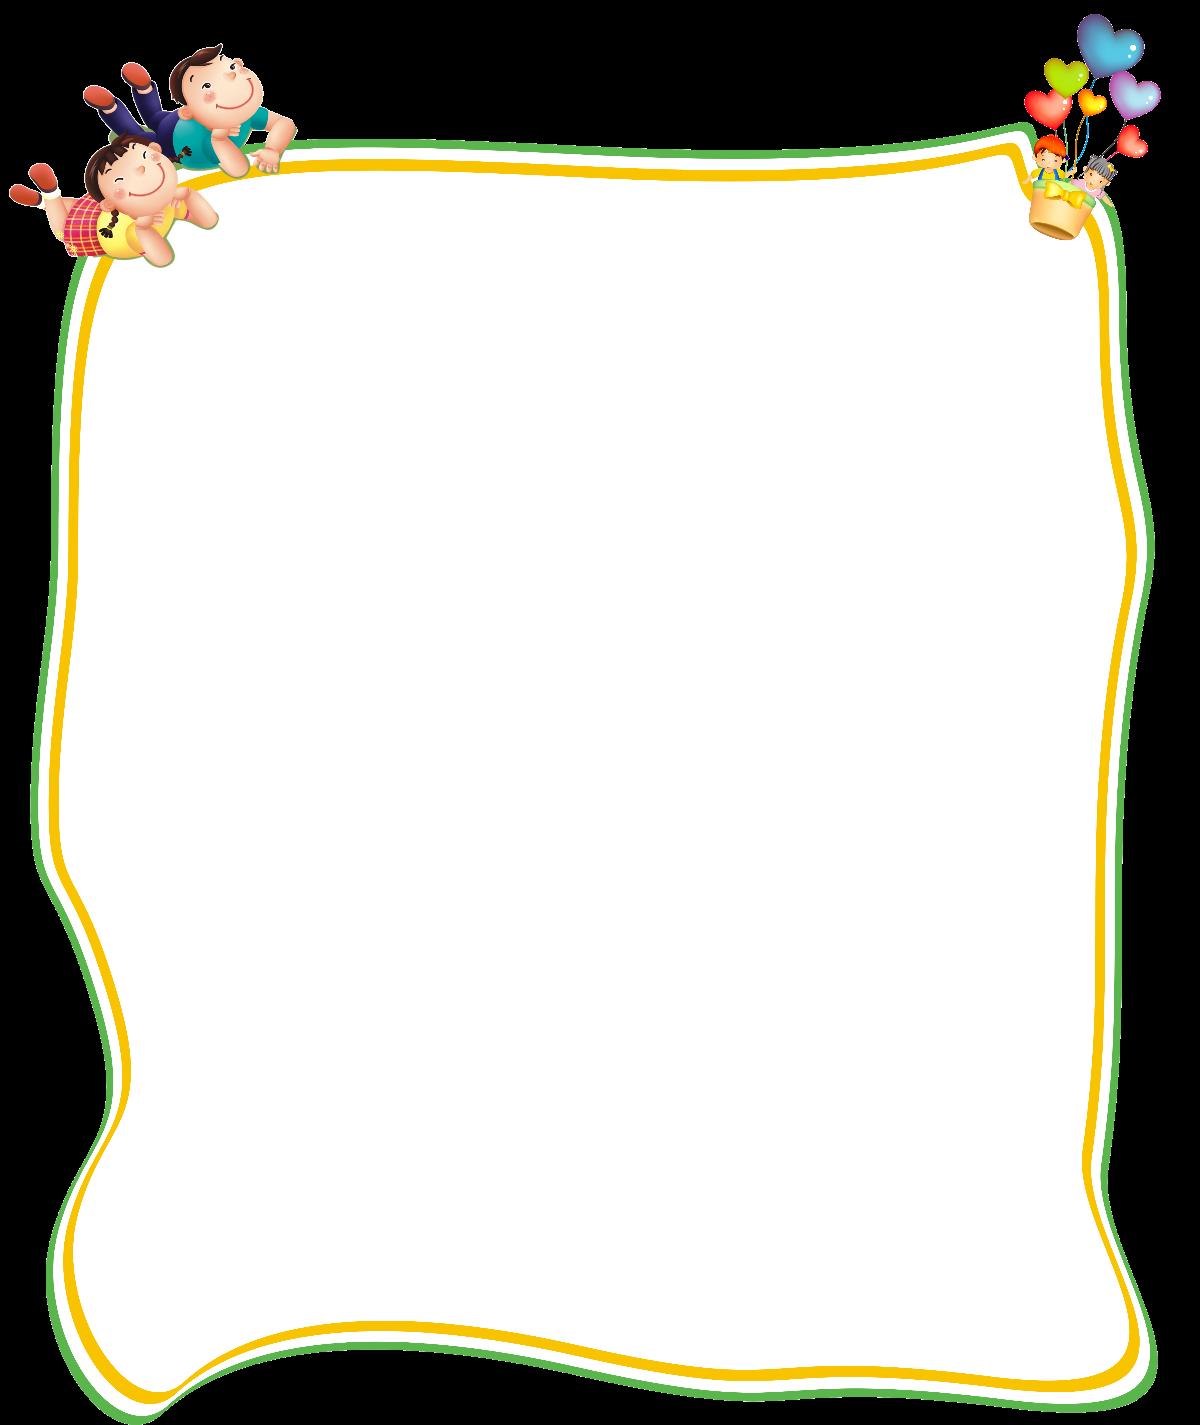 ppt 背景 背景图片 边框 模板 设计 相框 1200_1425